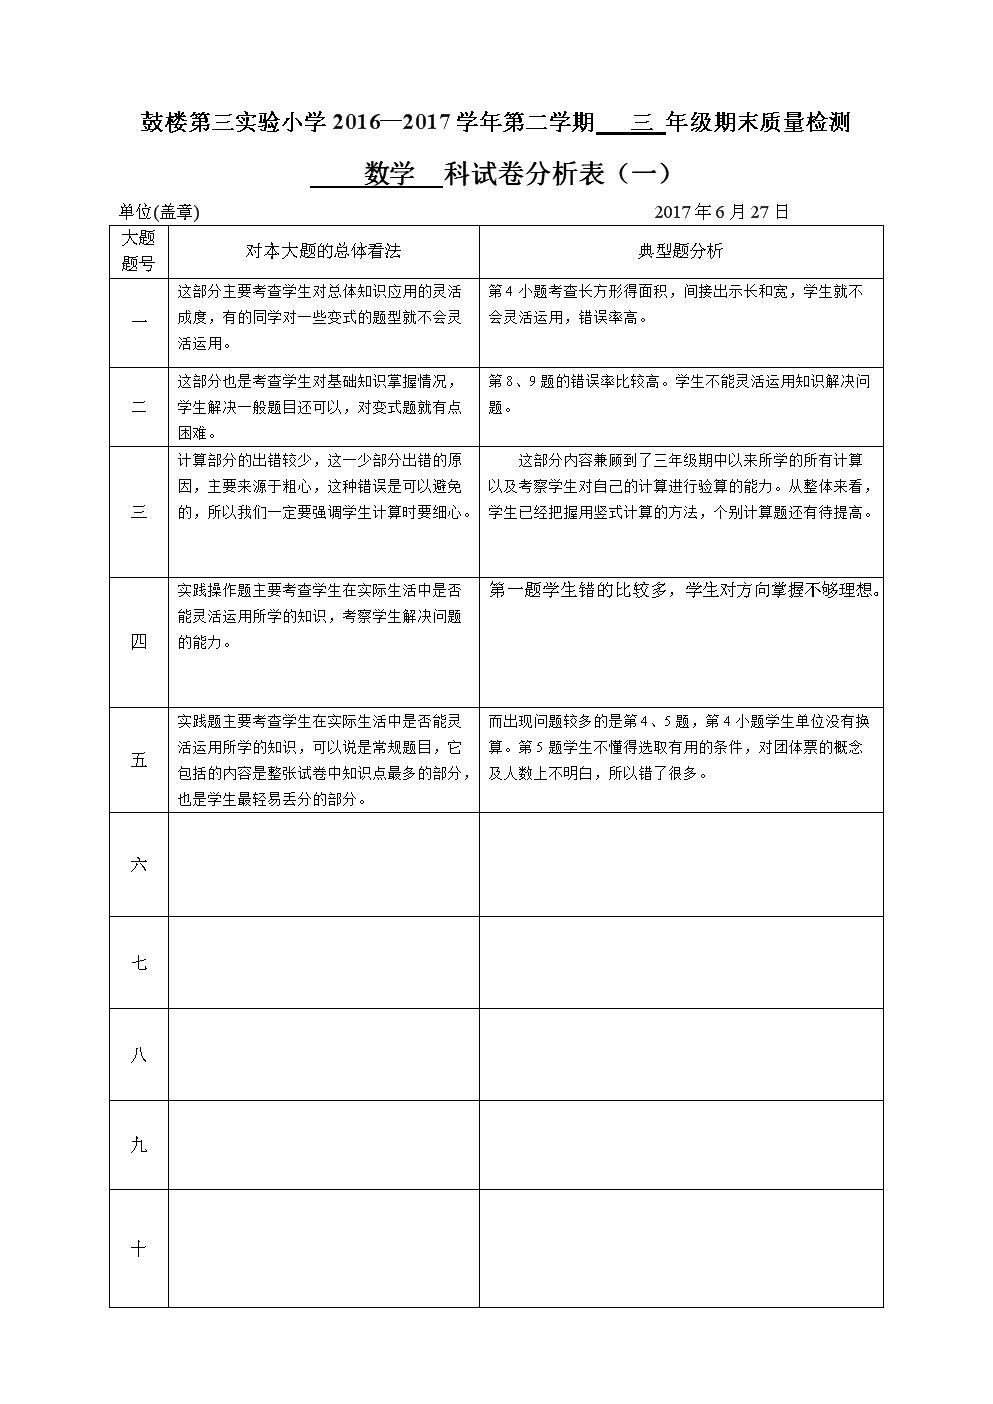 数学 科试卷分析表.doc